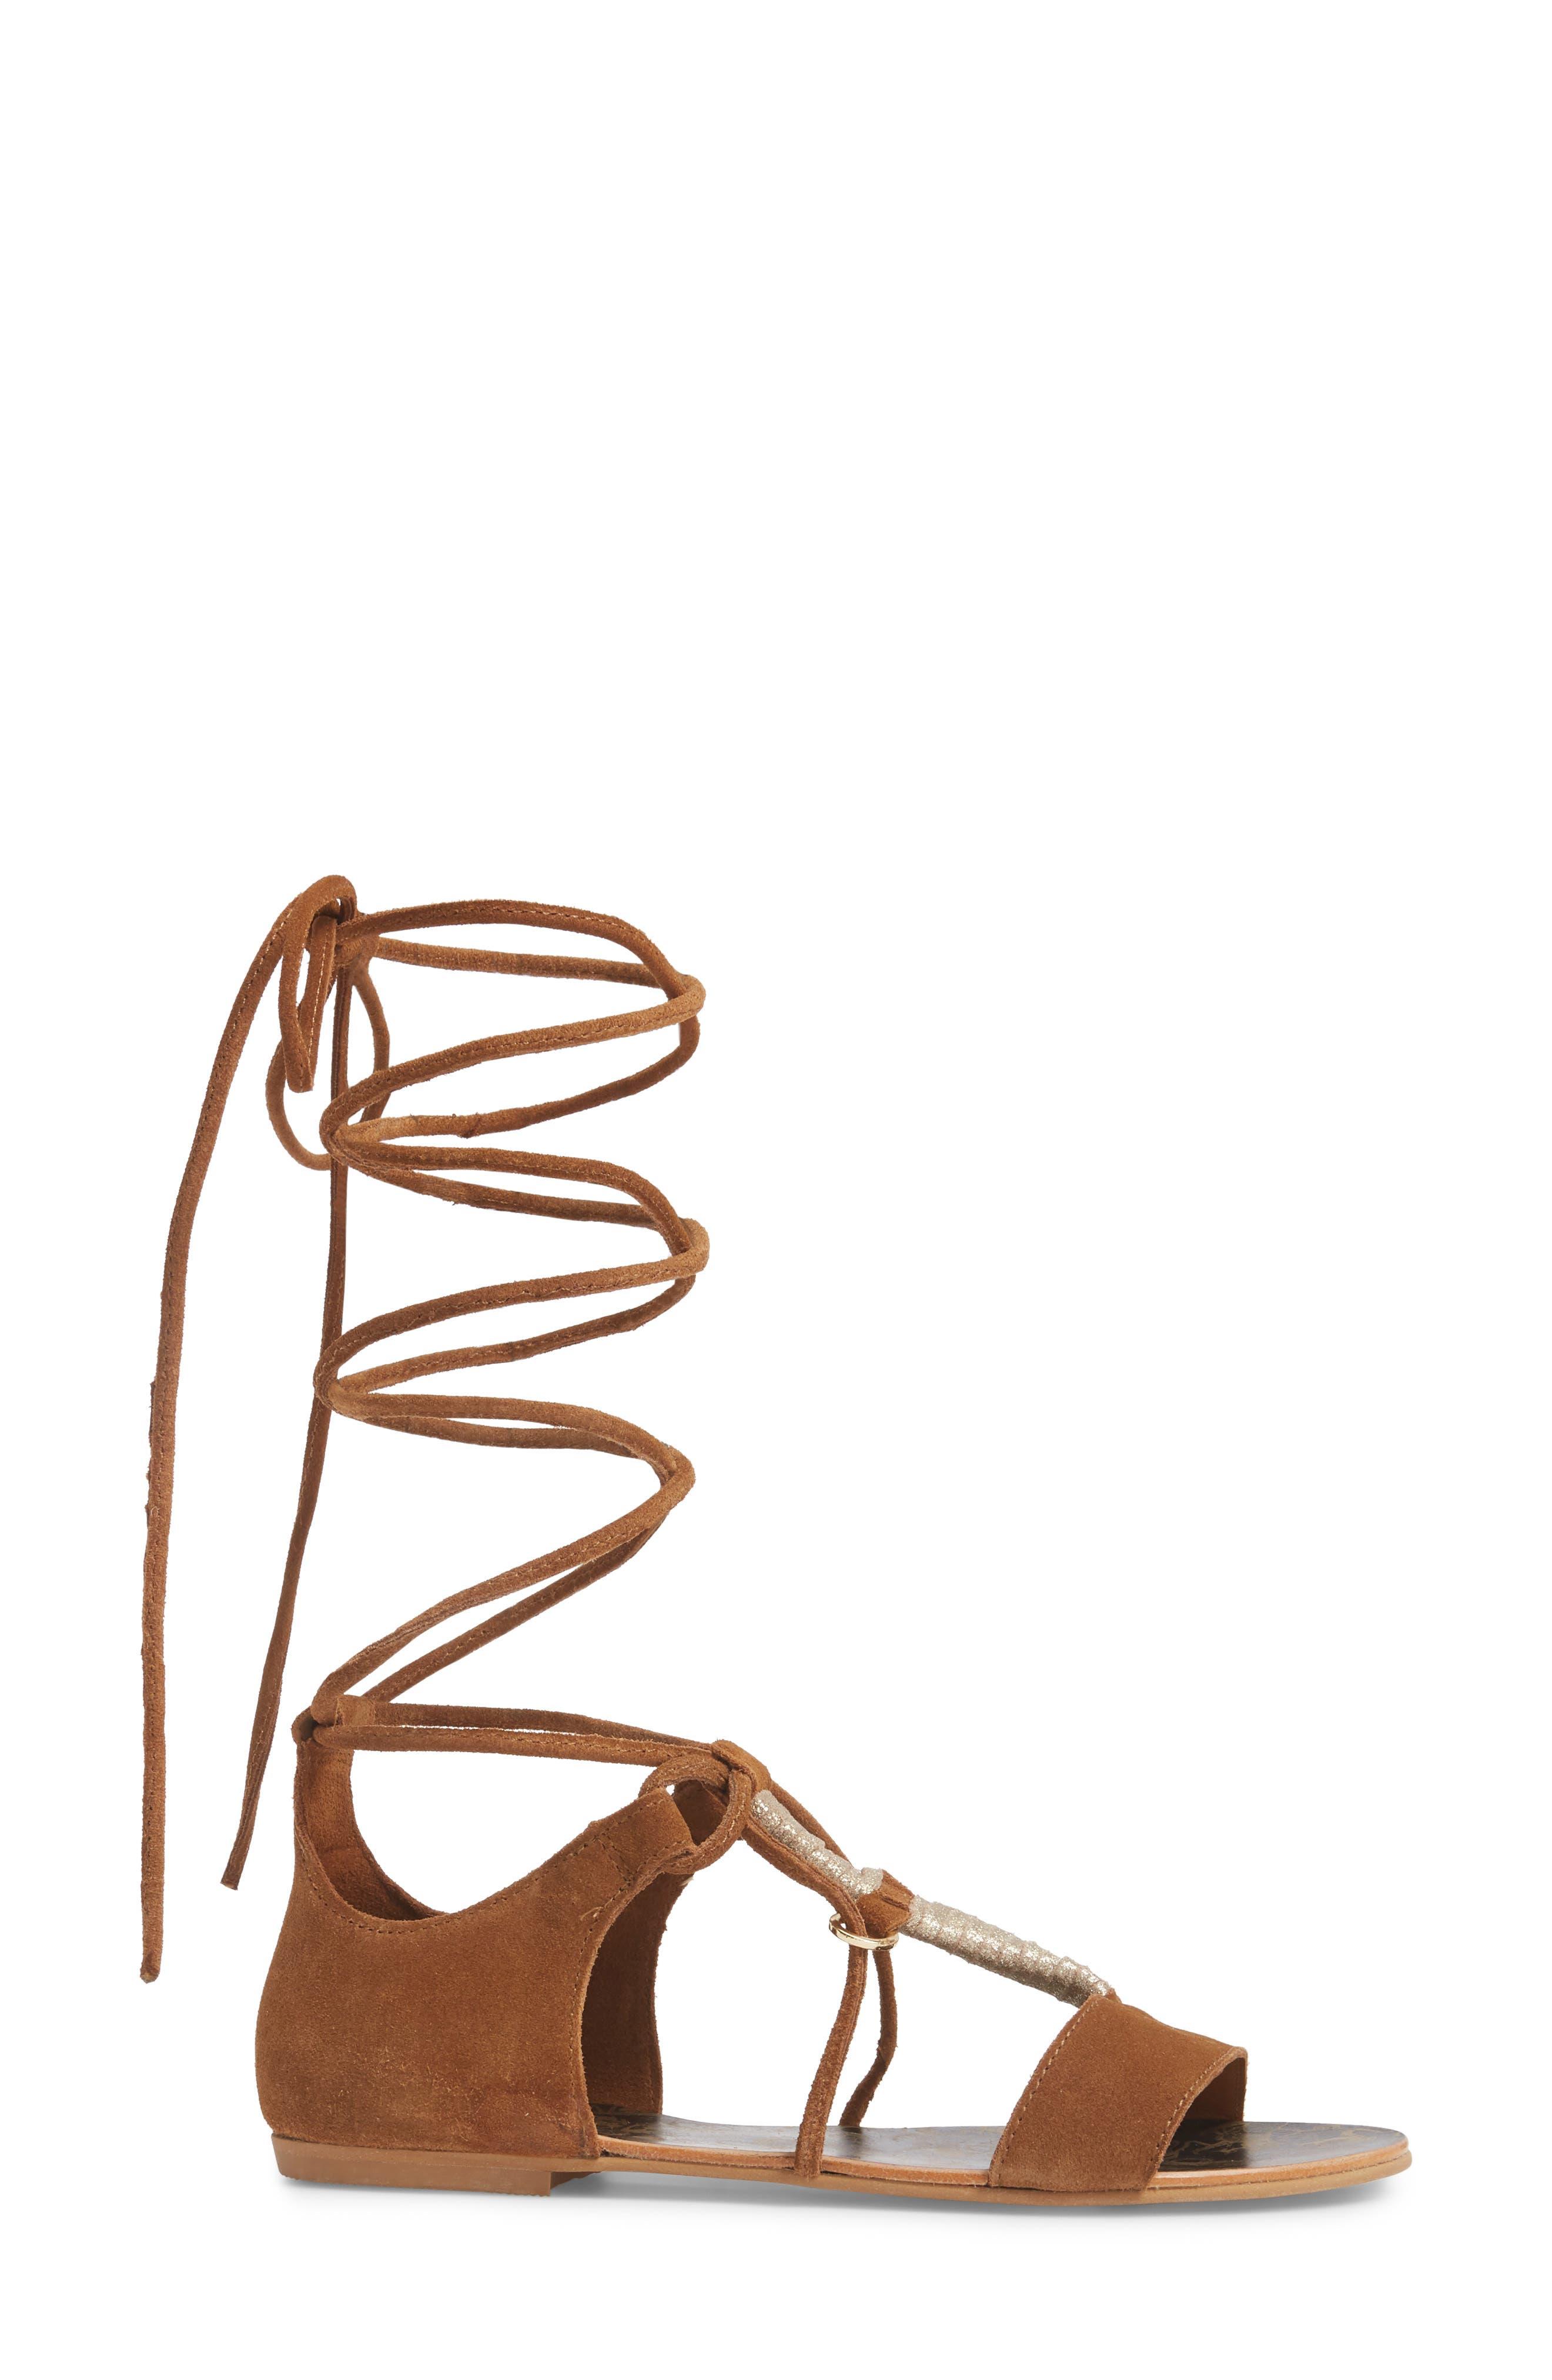 Fiji Wraparound Sandal,                             Alternate thumbnail 3, color,                             230